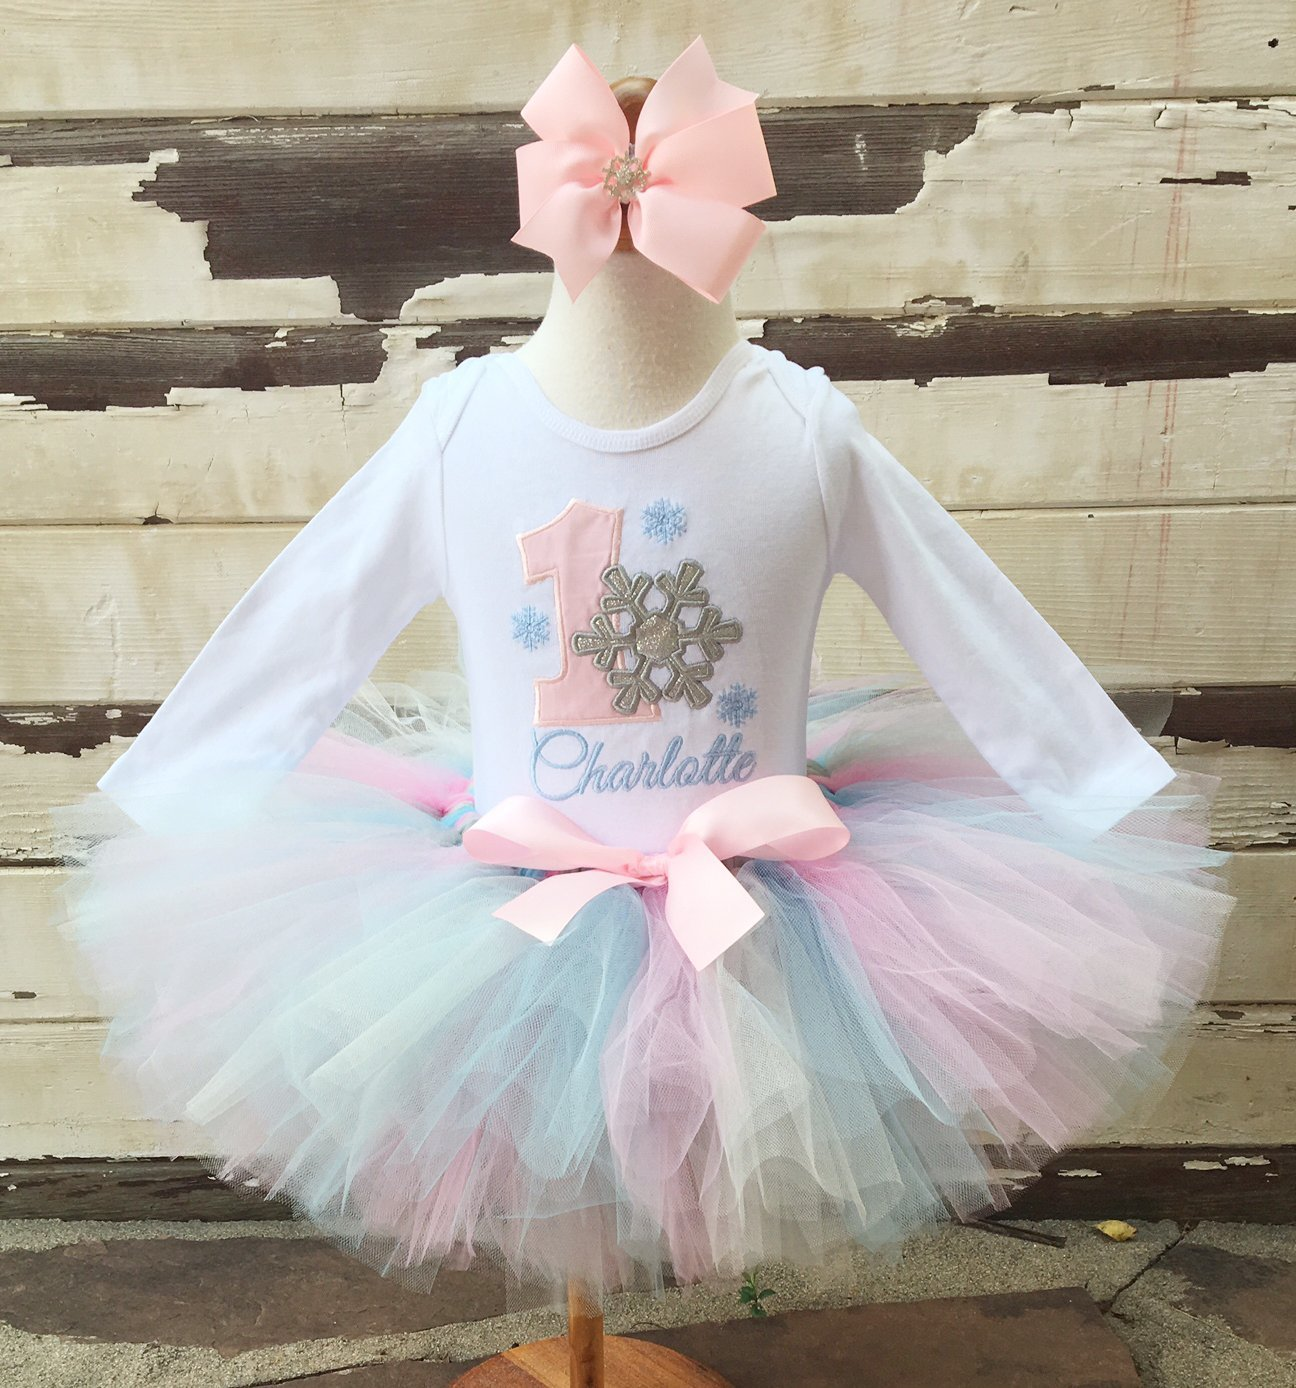 Birthday Tutu Winter Birthday Shirt Snow Flake 2nd Birthday Outfit Baby Girl 2nd Birthday Outfit Winter Birthday Party Outfit